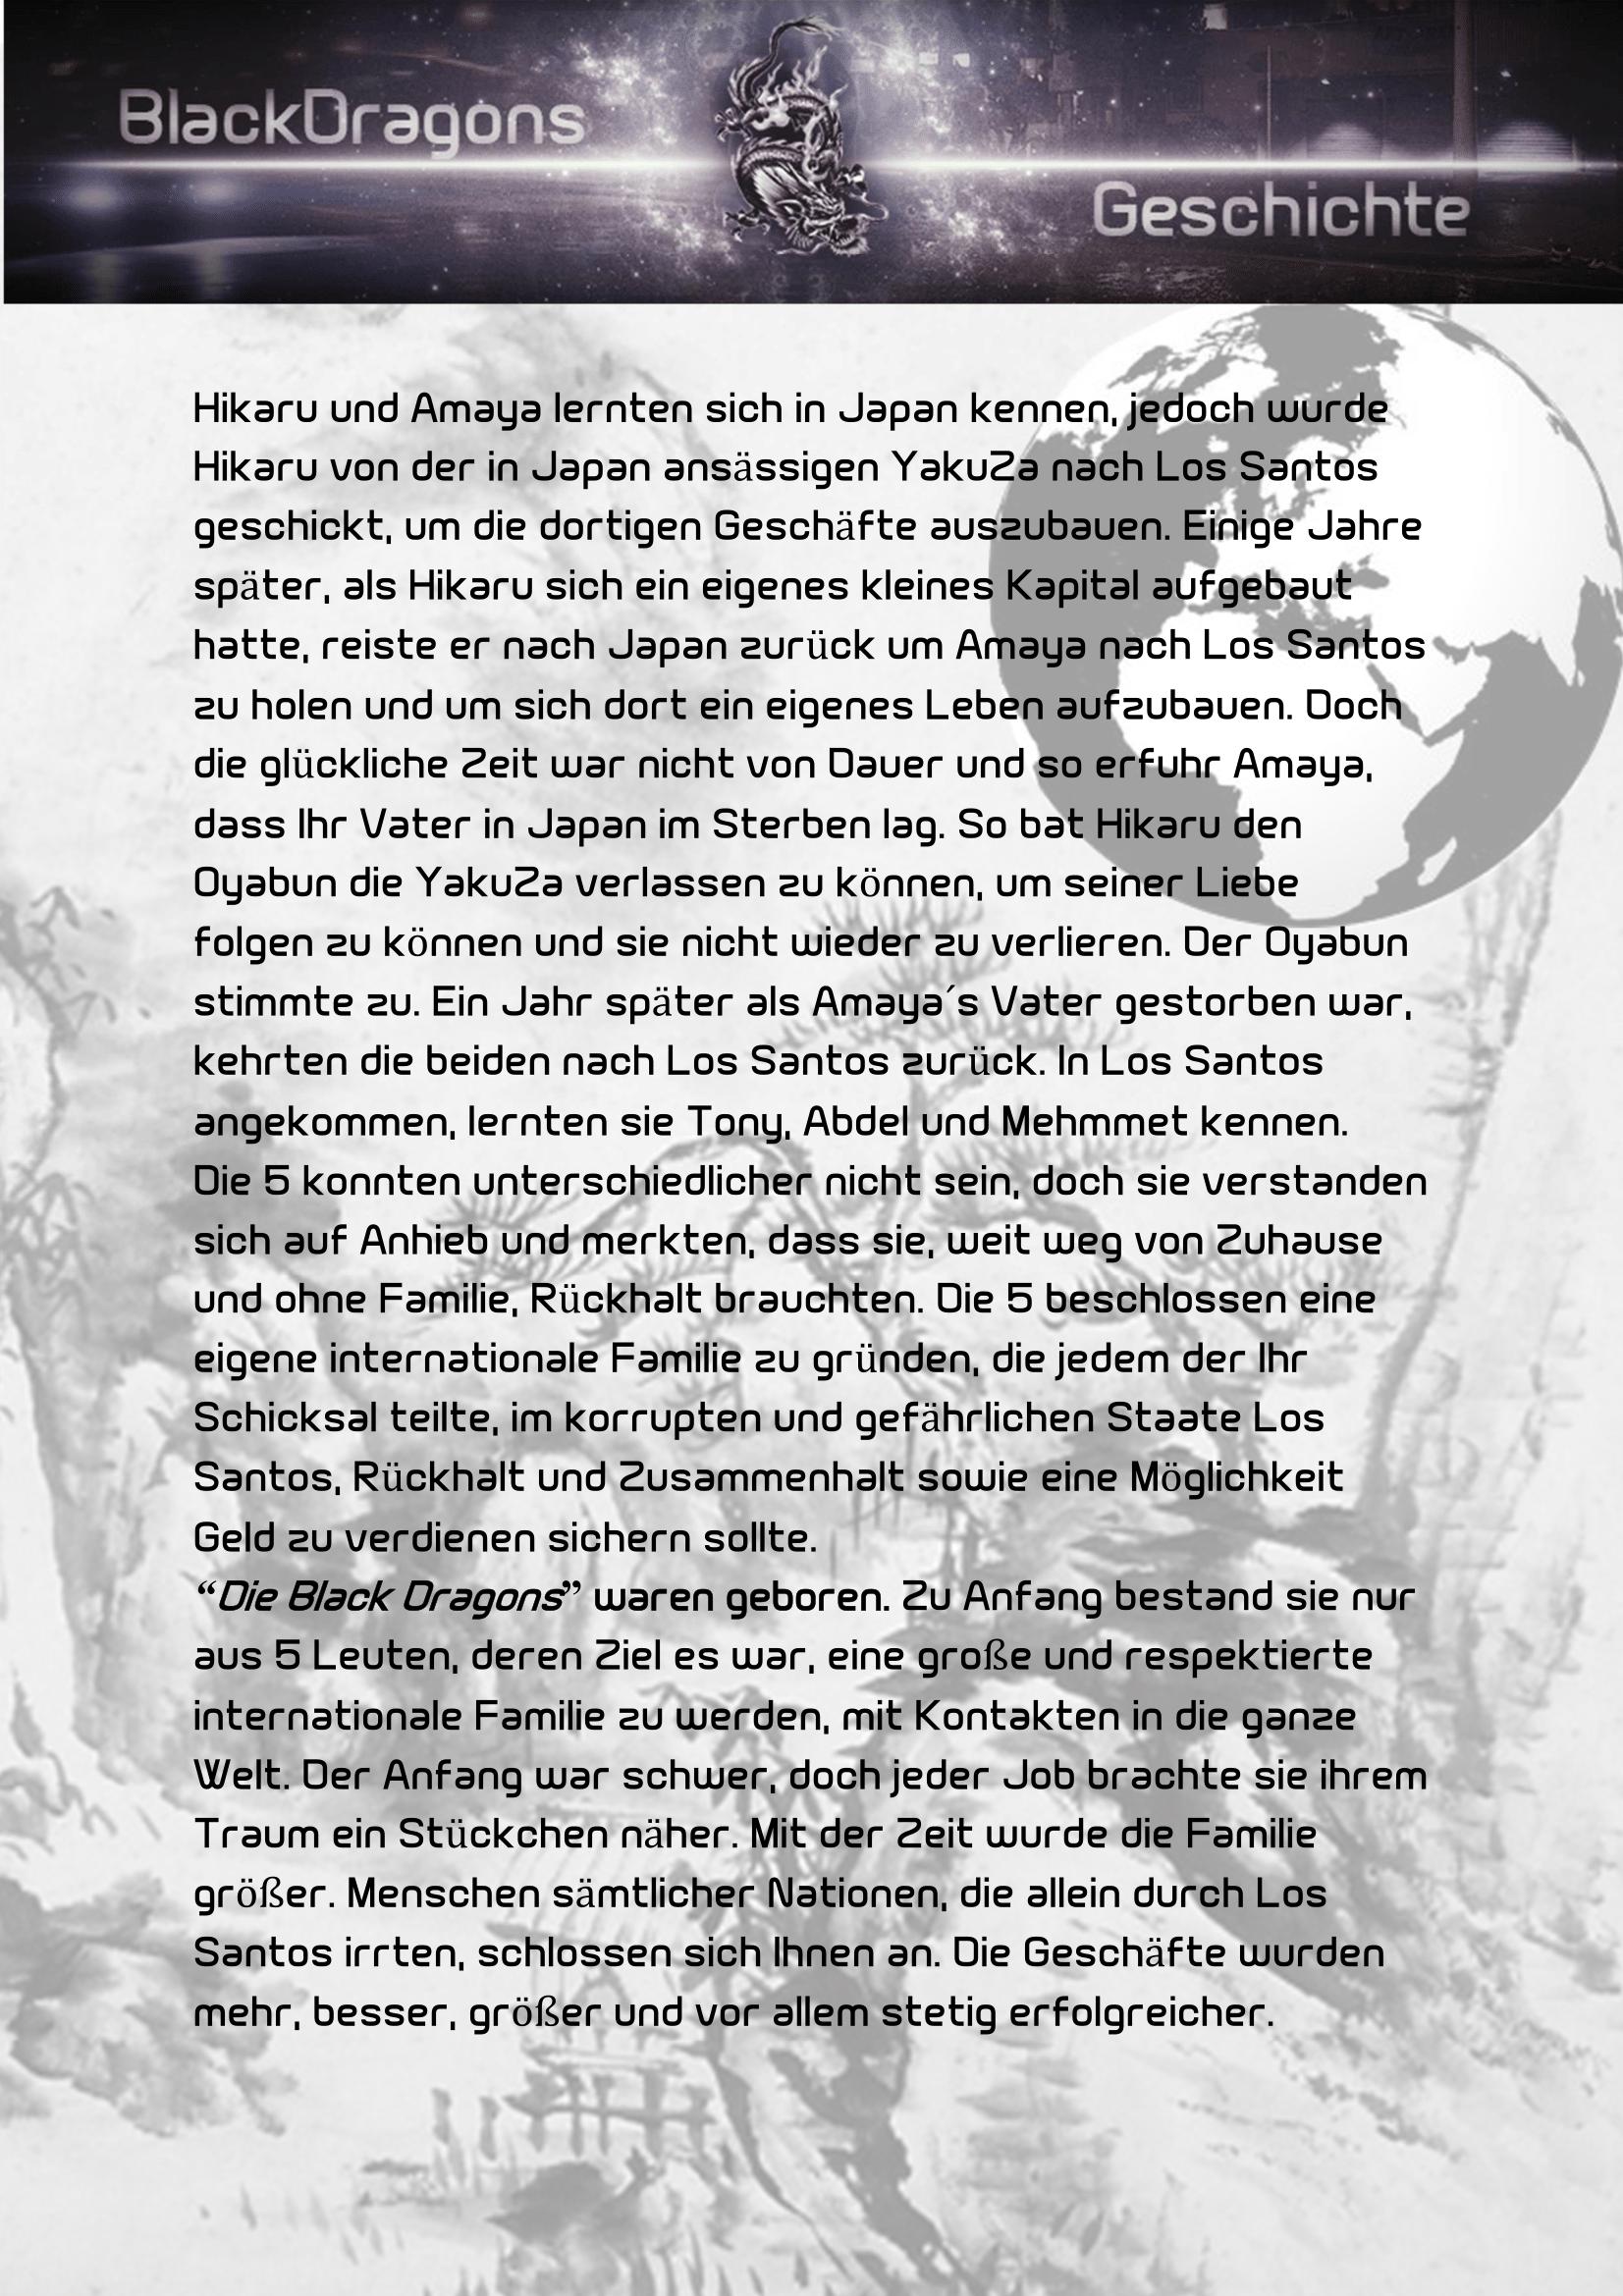 4geschichte-1ese71.png